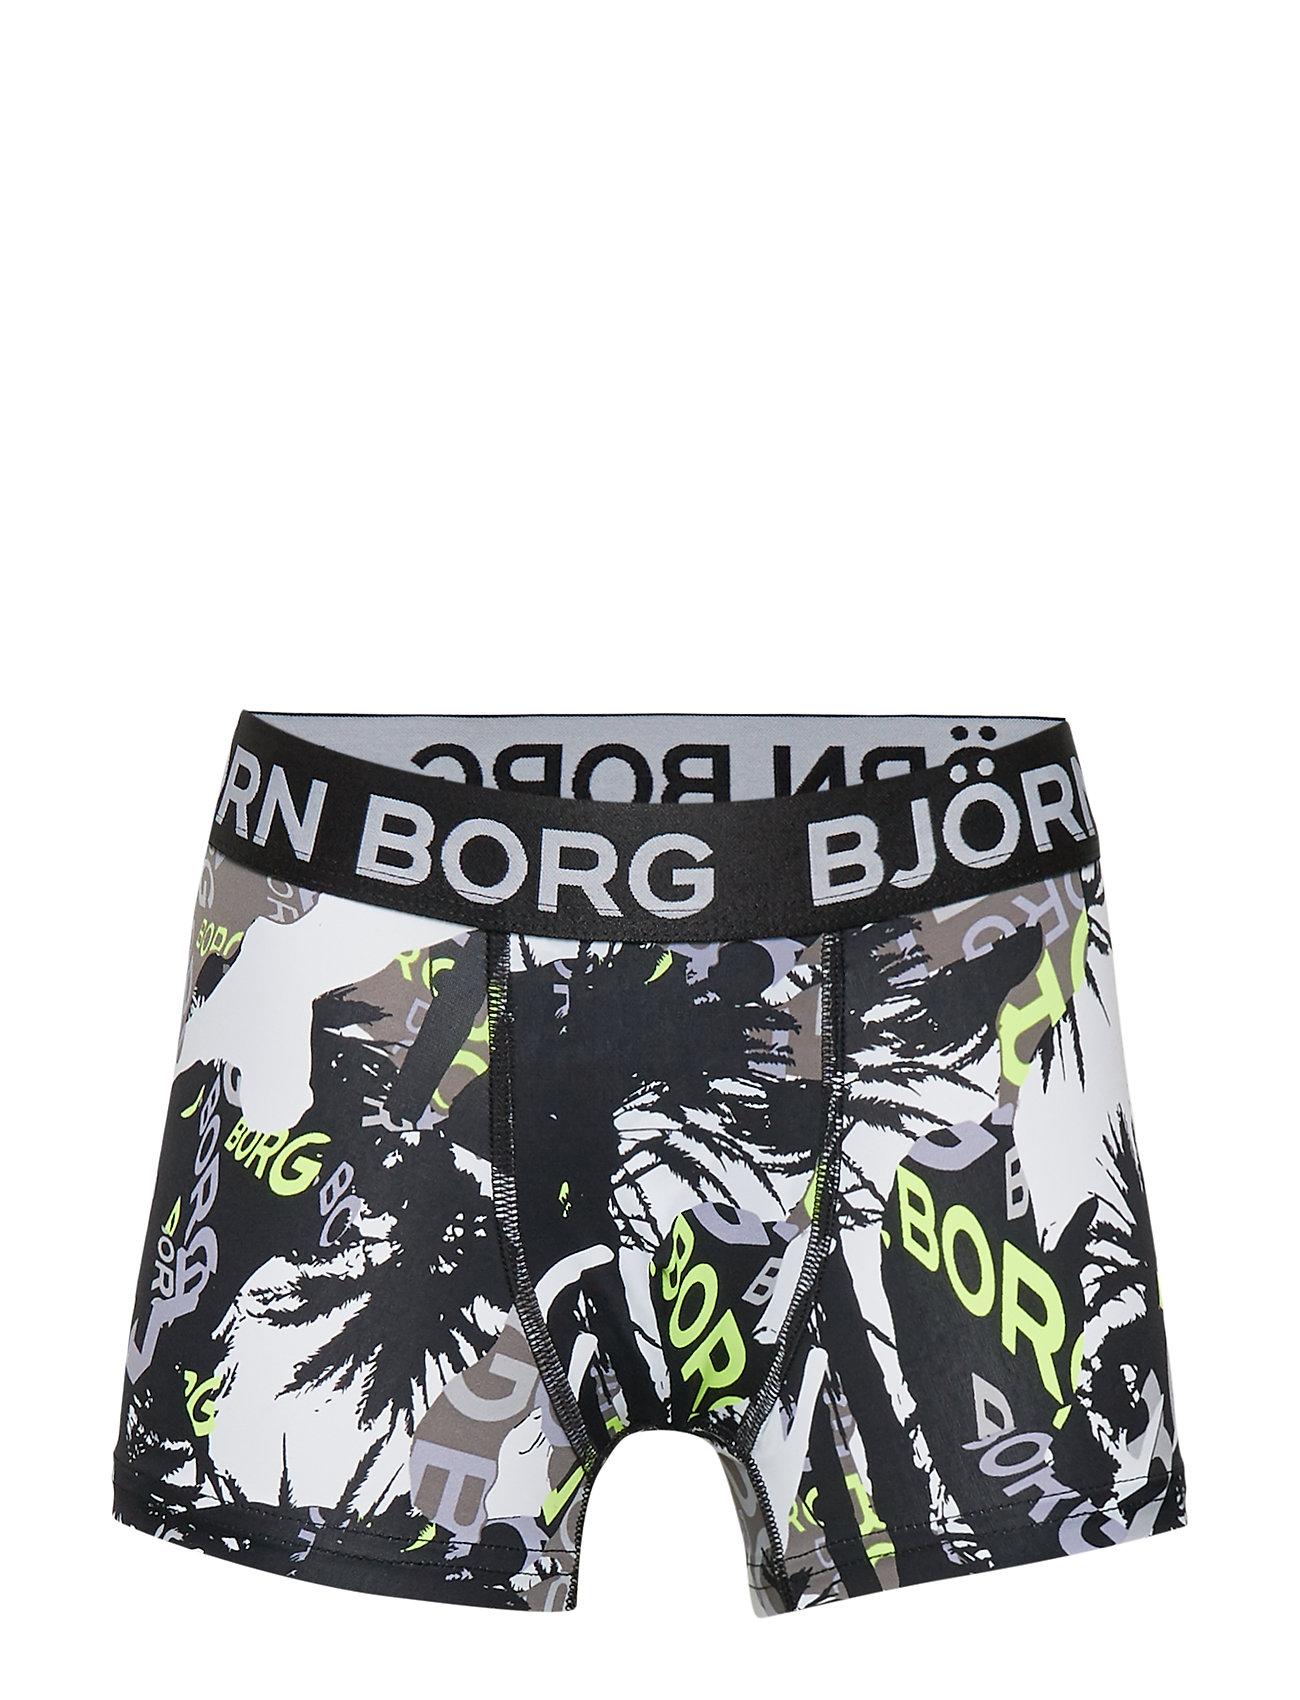 Björn Borg SHORTS BB LA BOLD BORG 1p